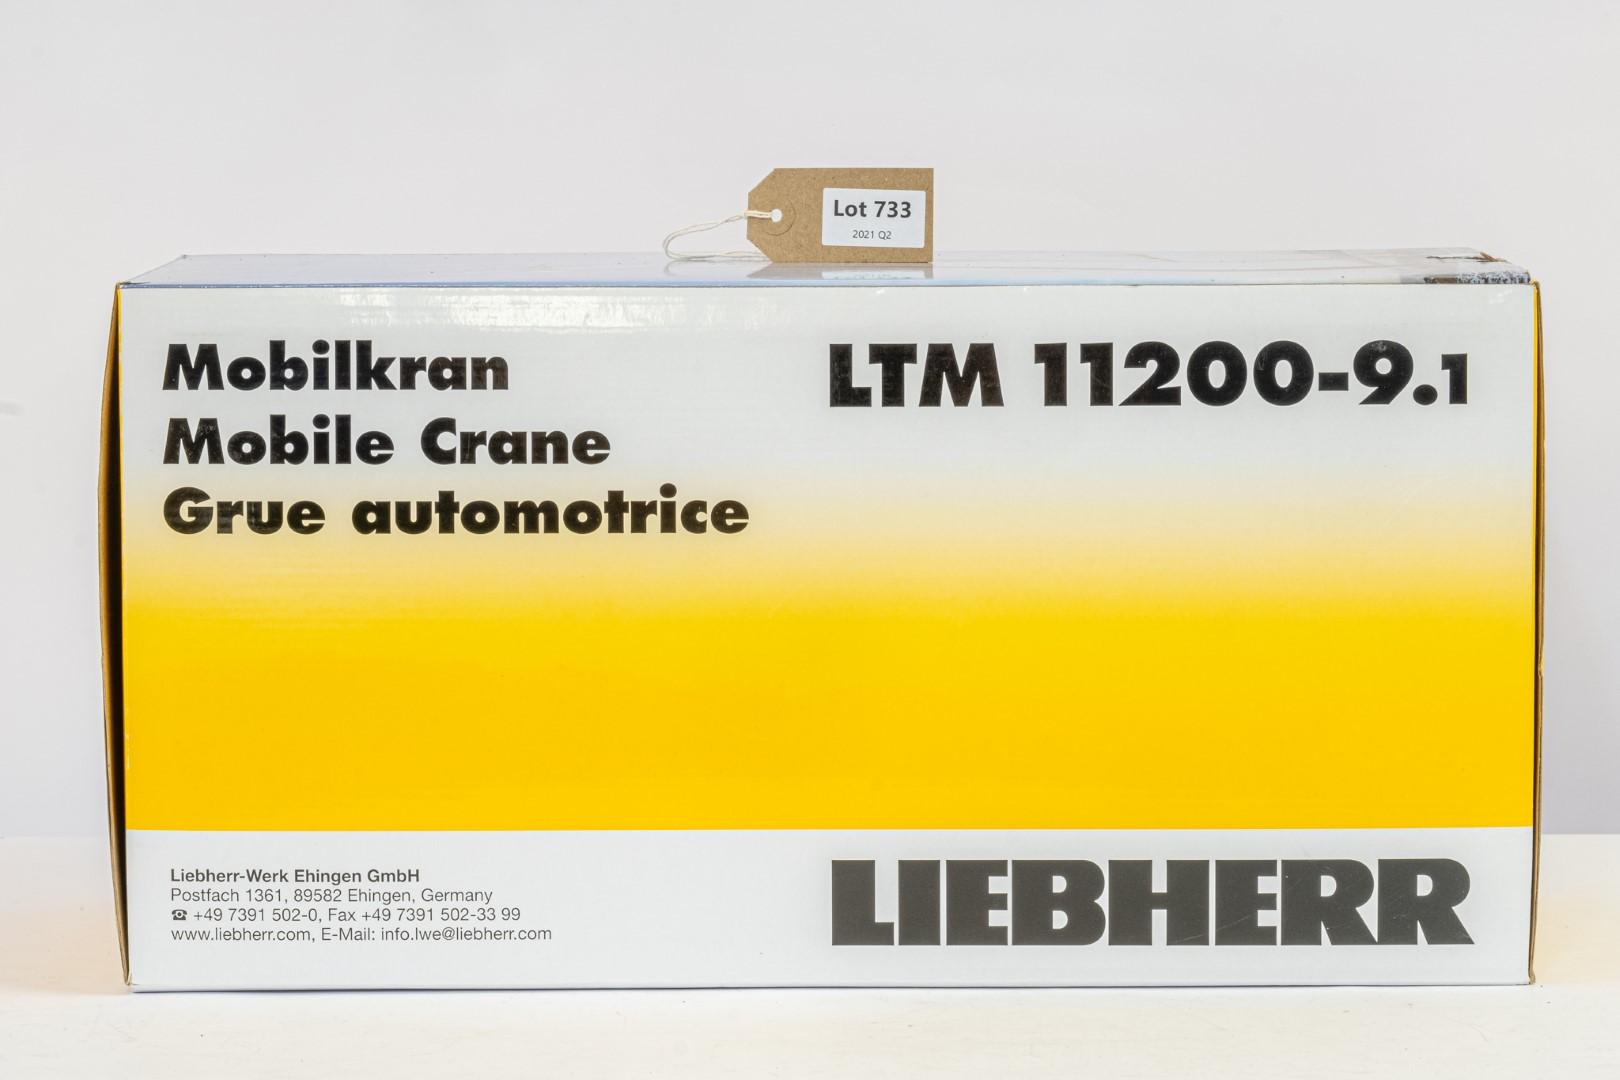 NZG Leibherr LTM 11200-9.1 Transbiaga Crane Blue -